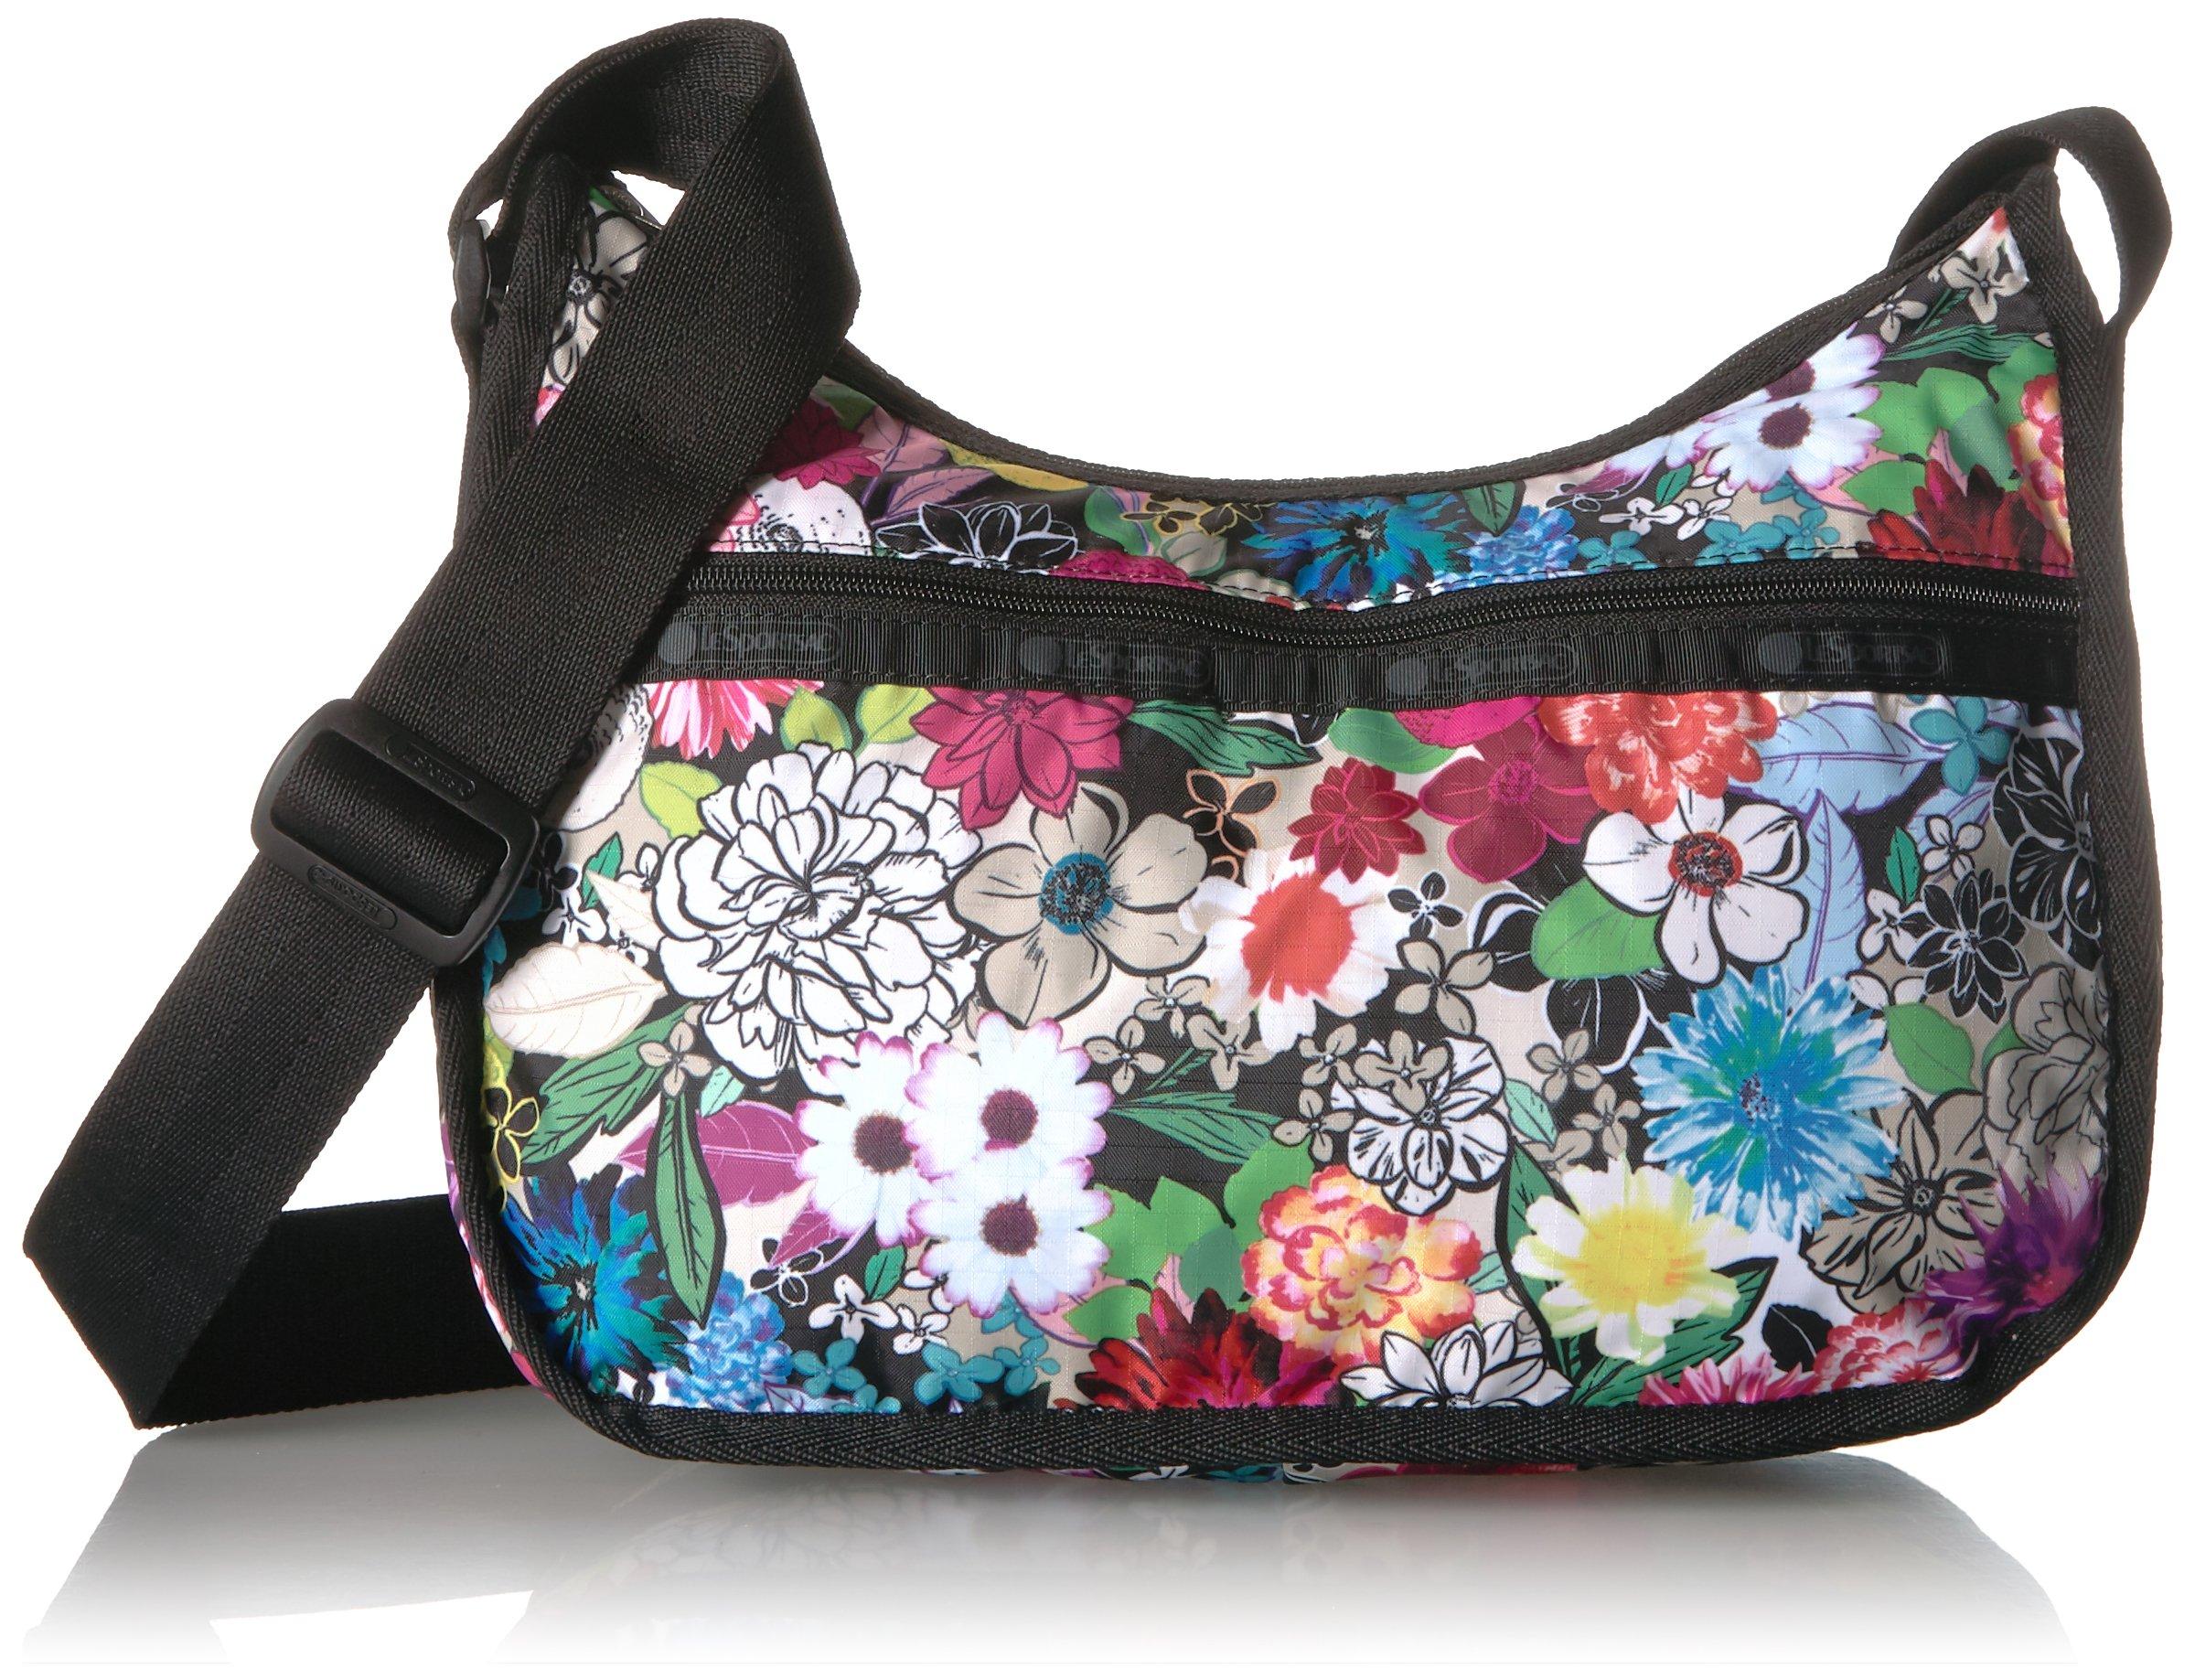 LeSportsac Classic Hobo Handbag, sunlight floral